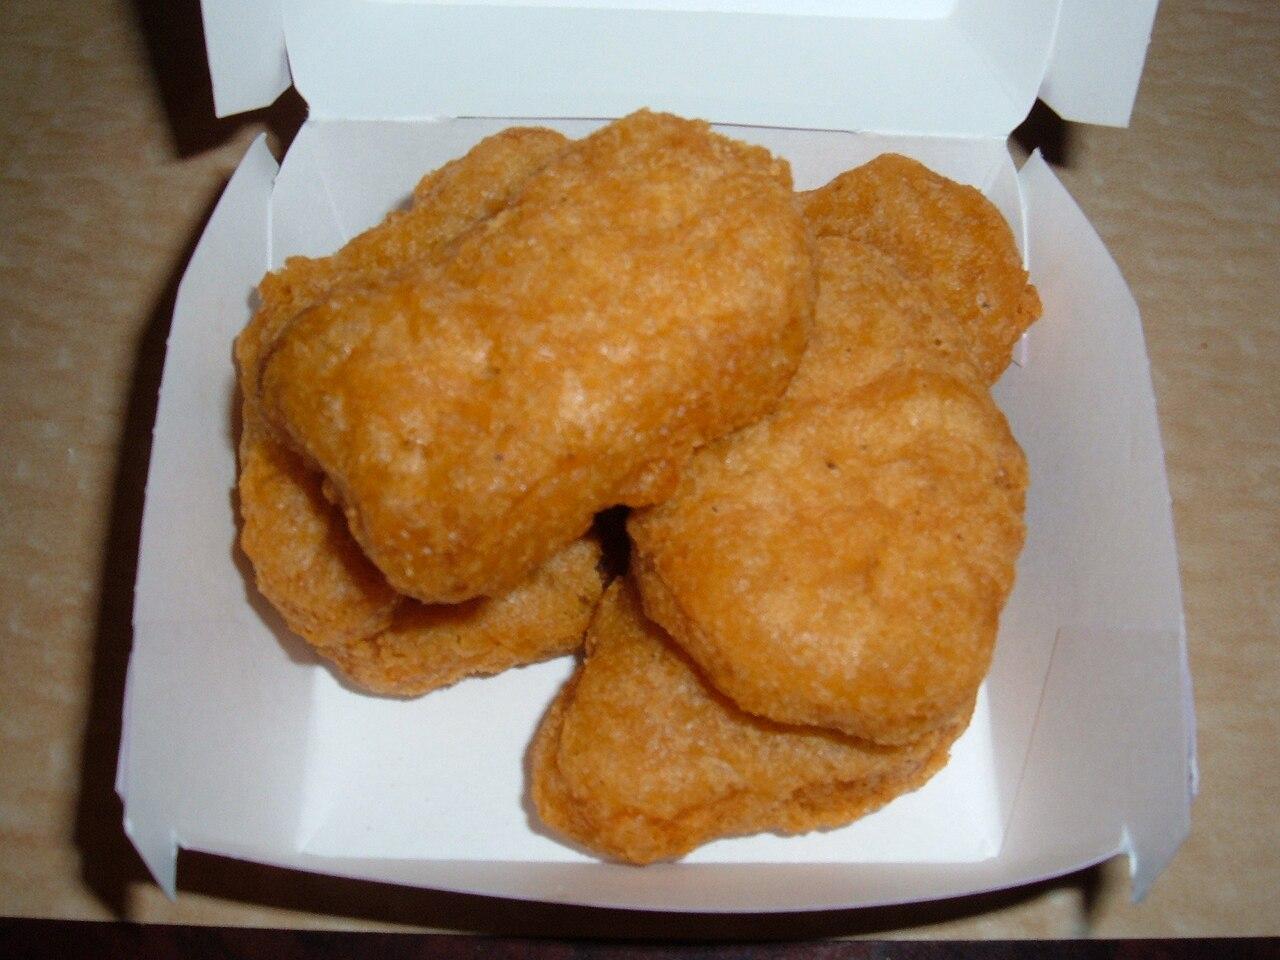 Chicken Mcnugget In School Kid In Trouble